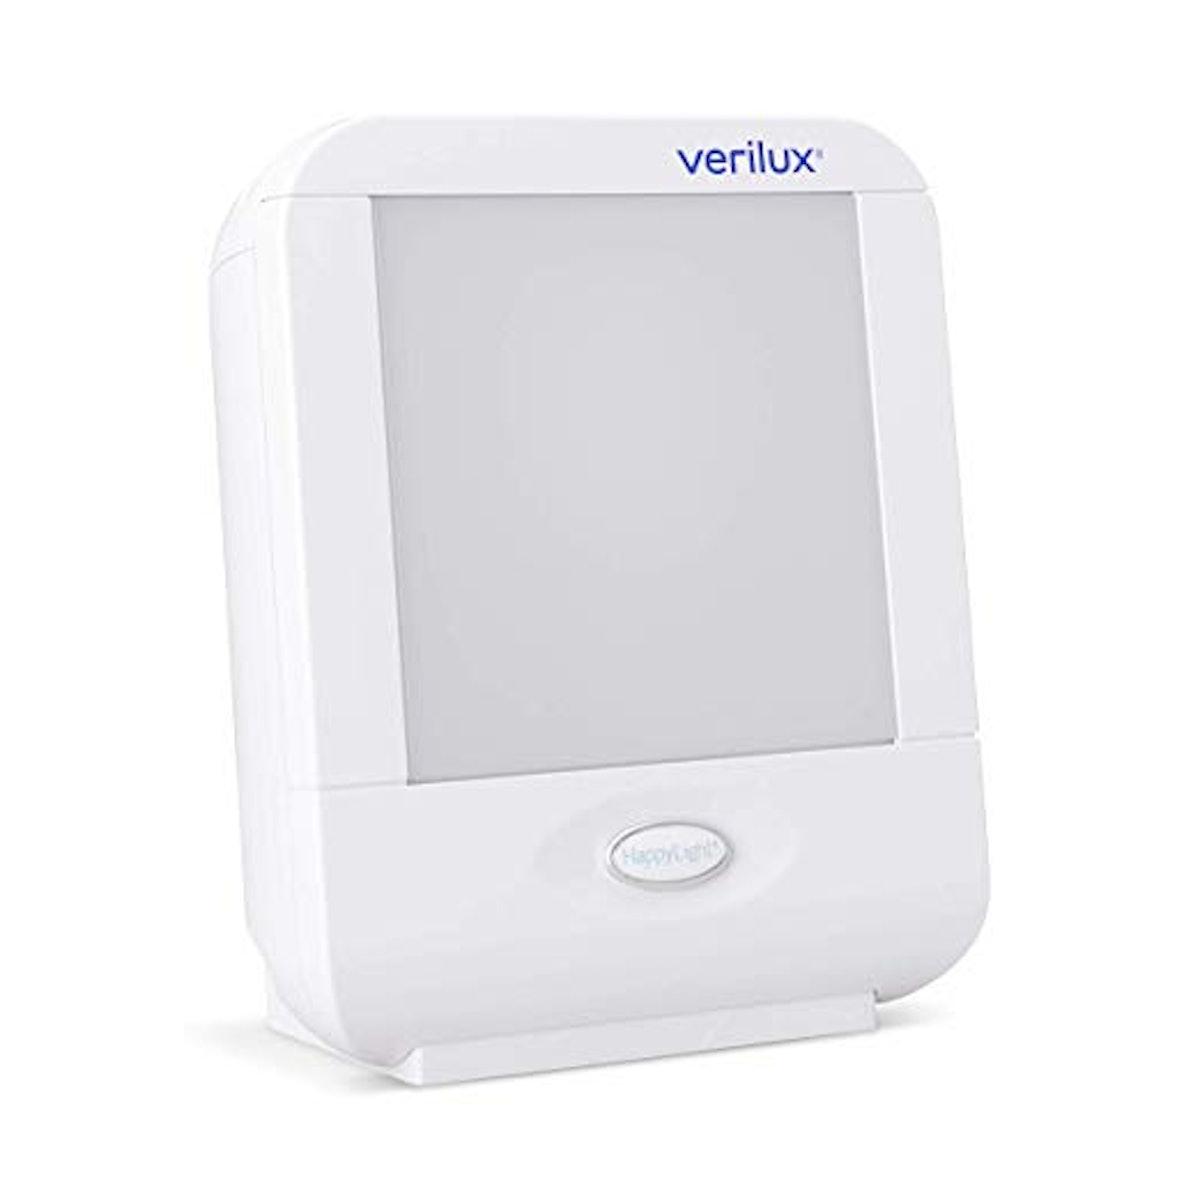 Verilux HappyLight Compact